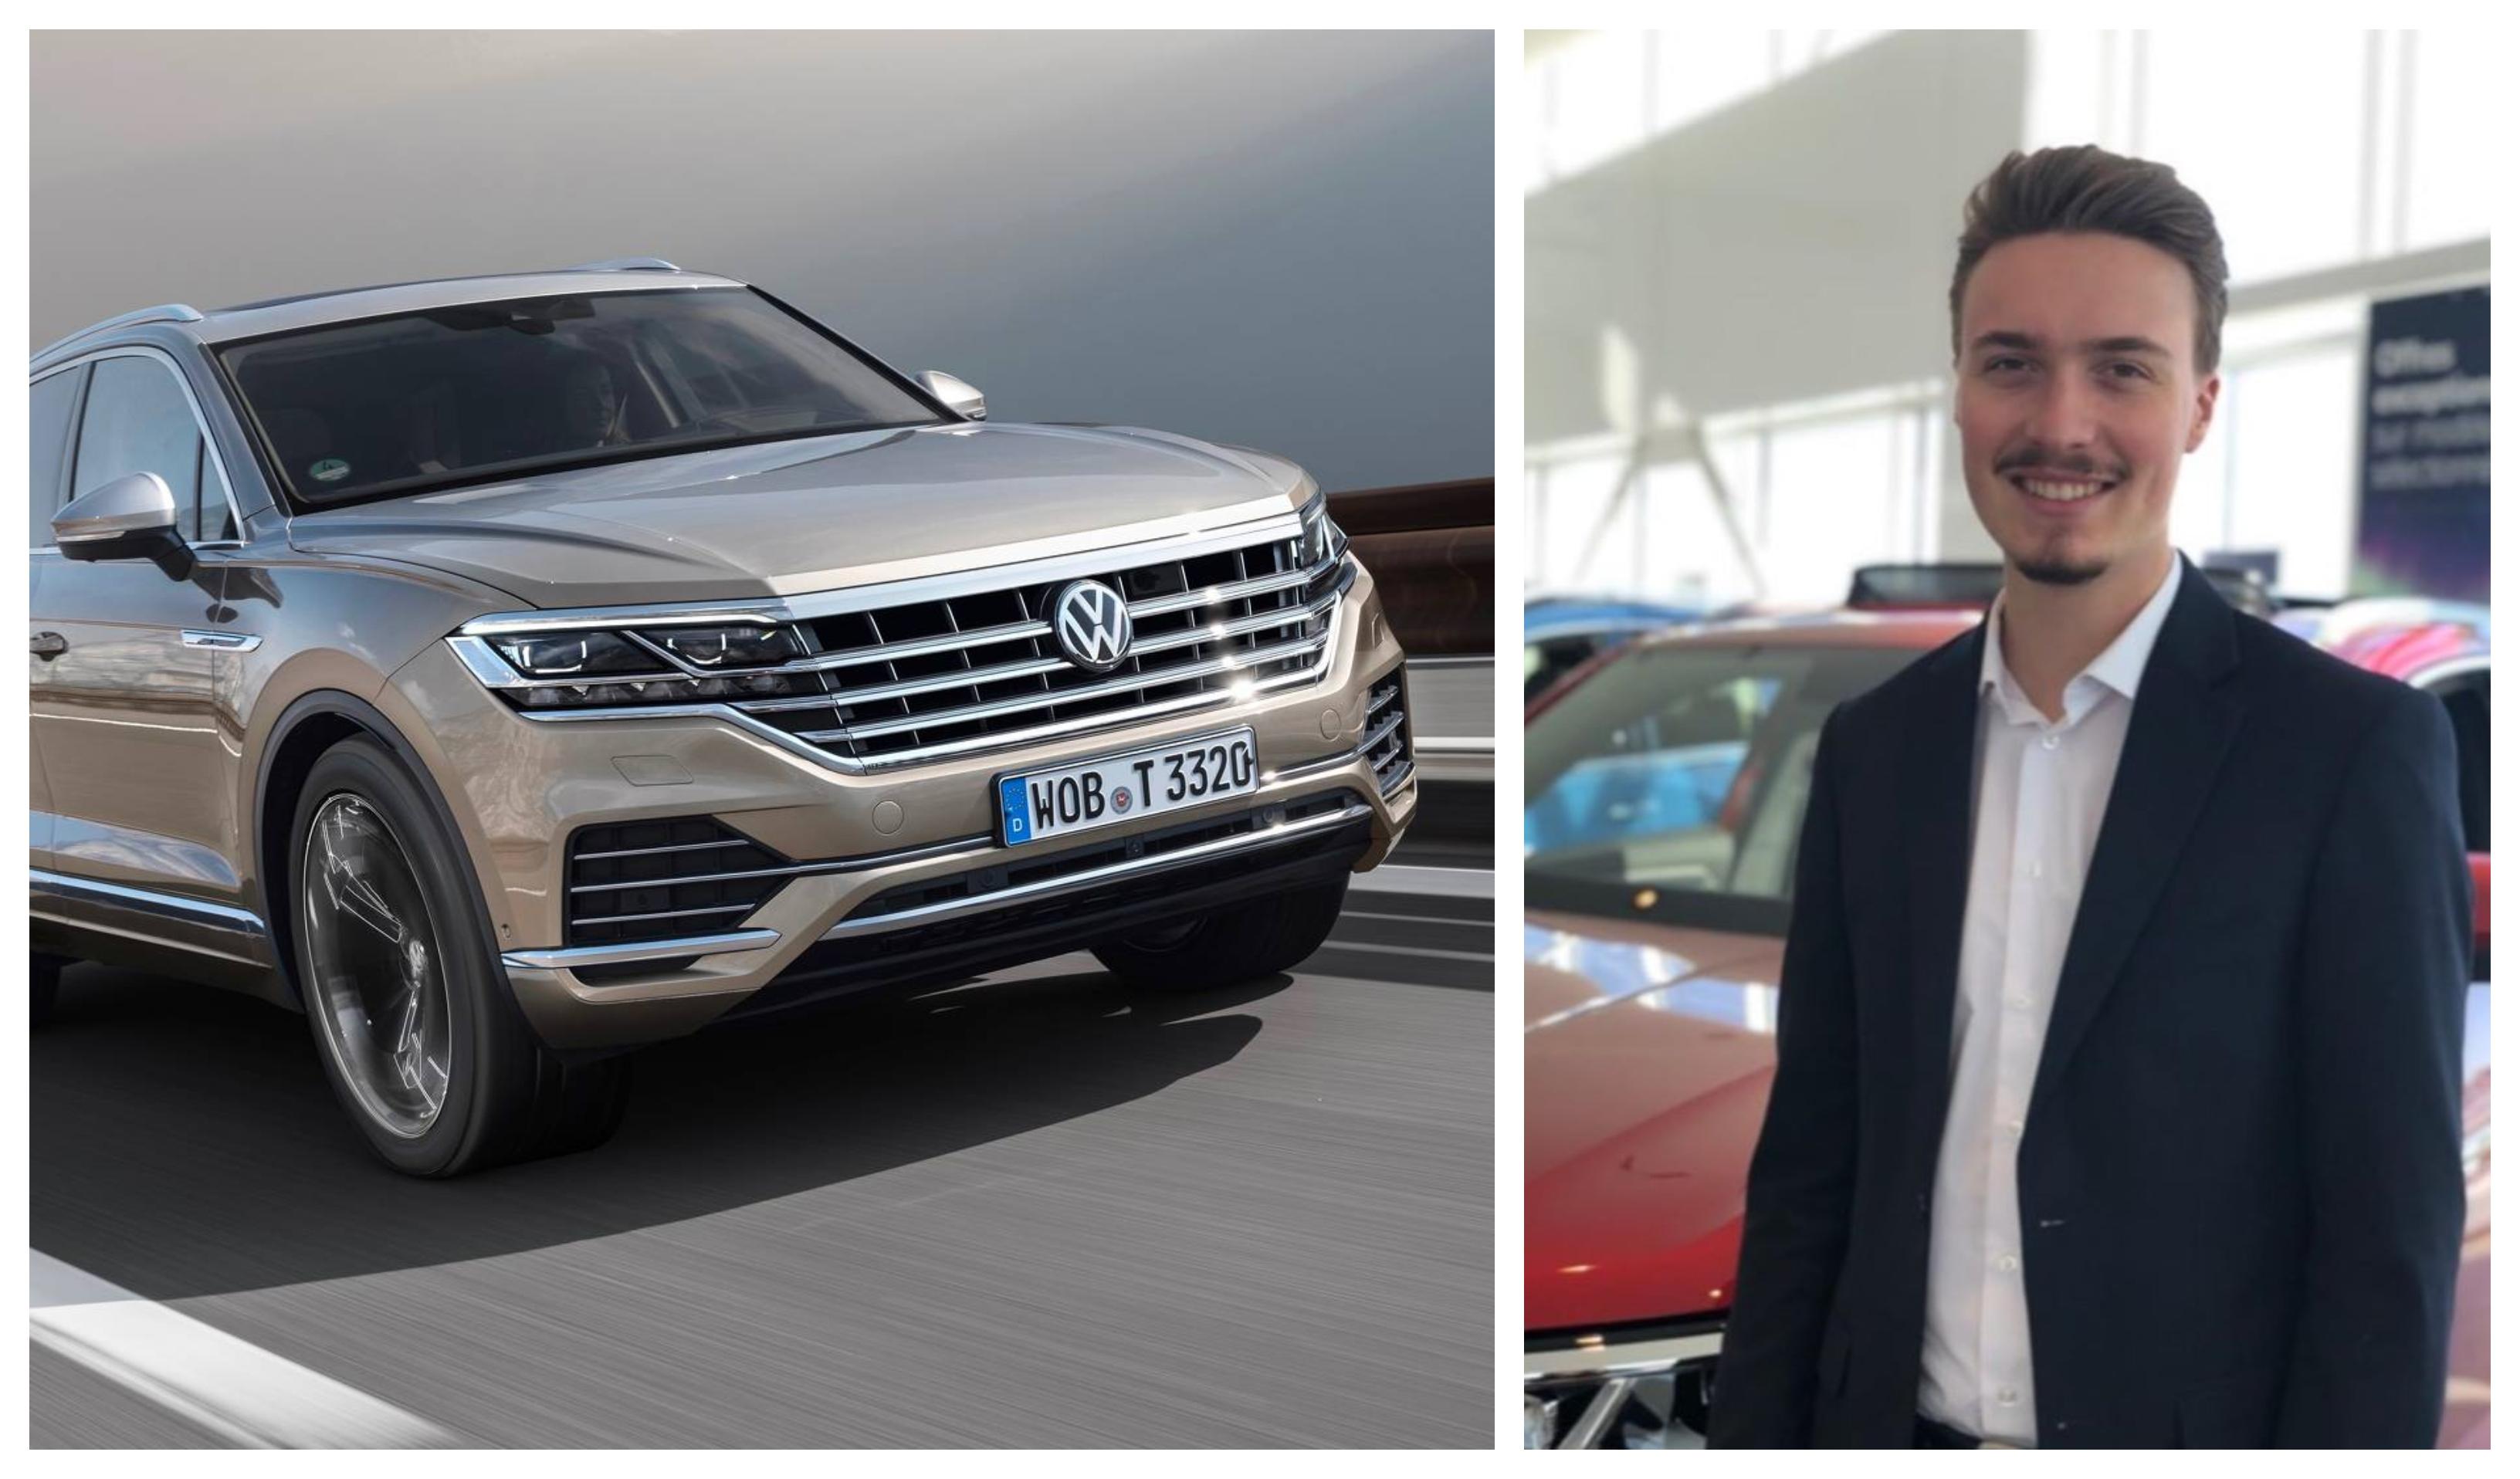 Philippe Bilodeau - Carrefour 40-640 Volkswagen